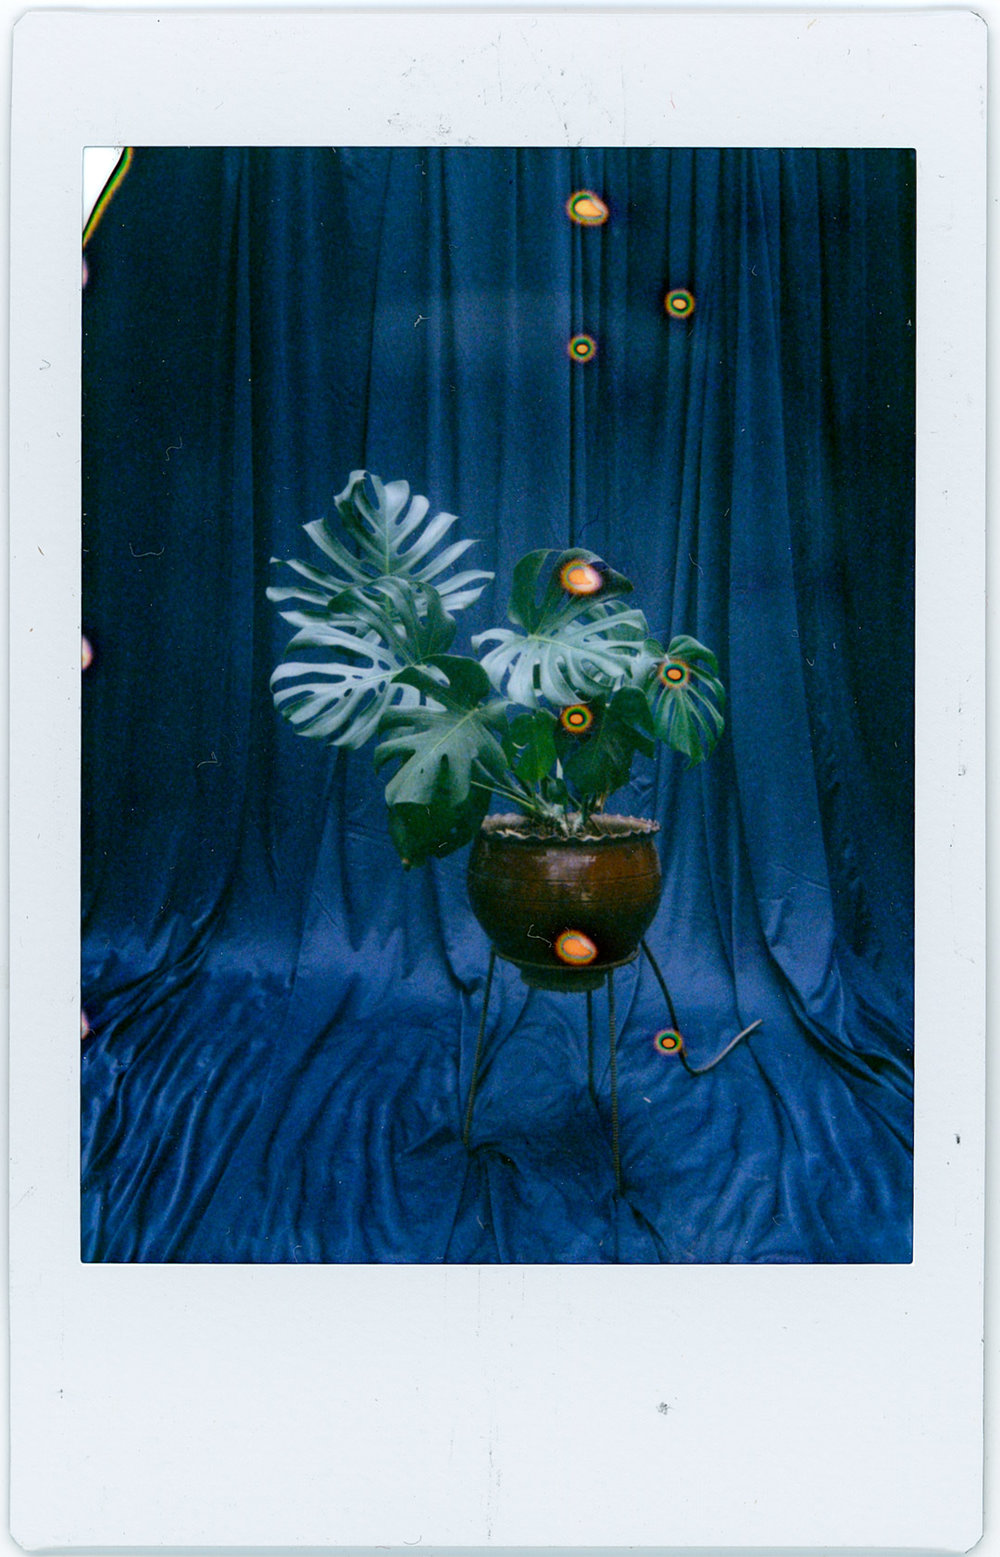 cortina-azul-3.jpg